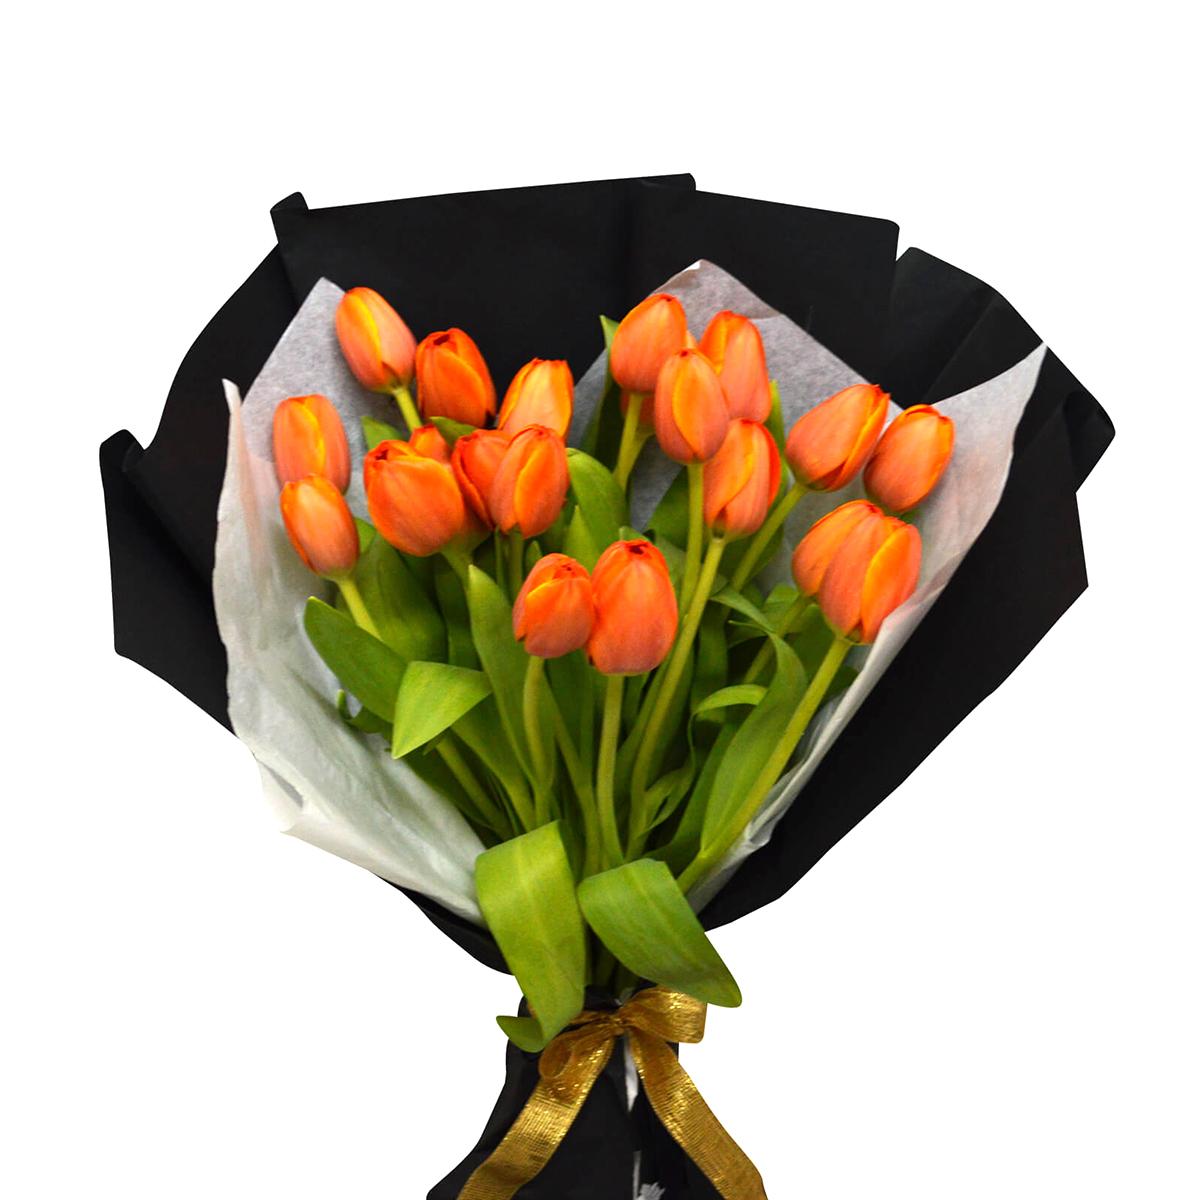 Ramo 20 Tulipanes de color Naranjo